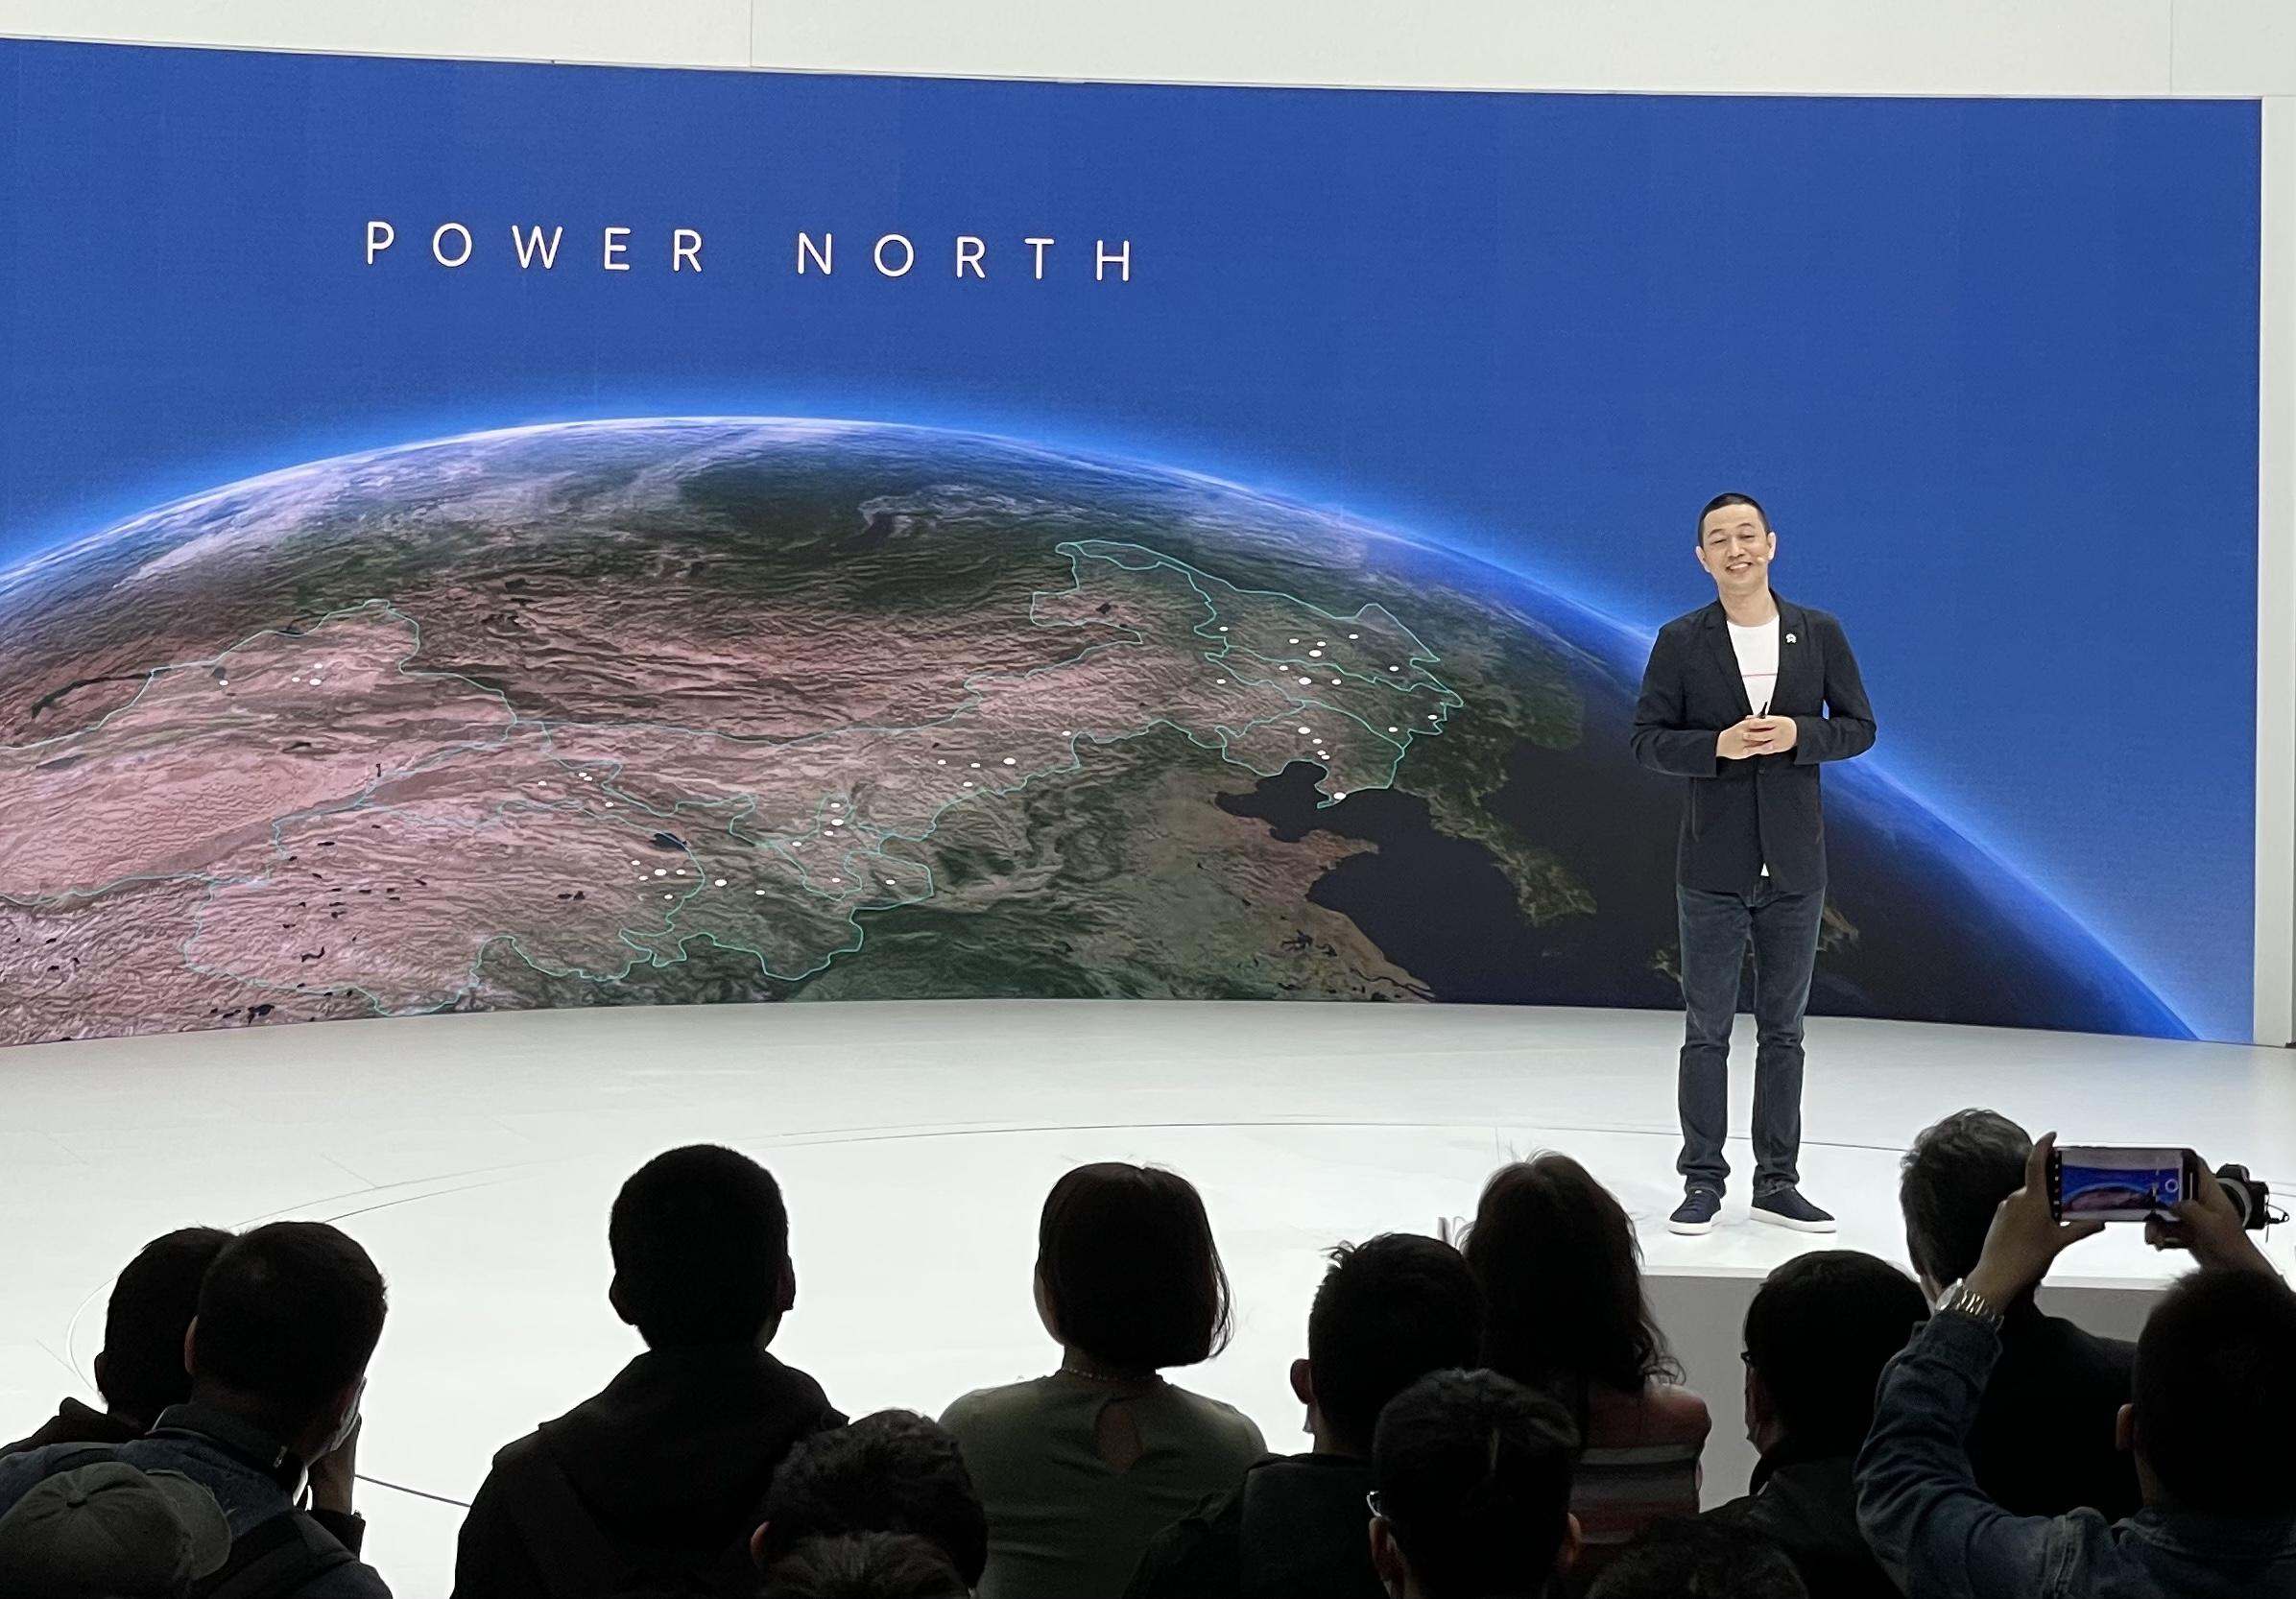 NIO unveils Power North plan, ET7 makes auto show debut-CnEVPost